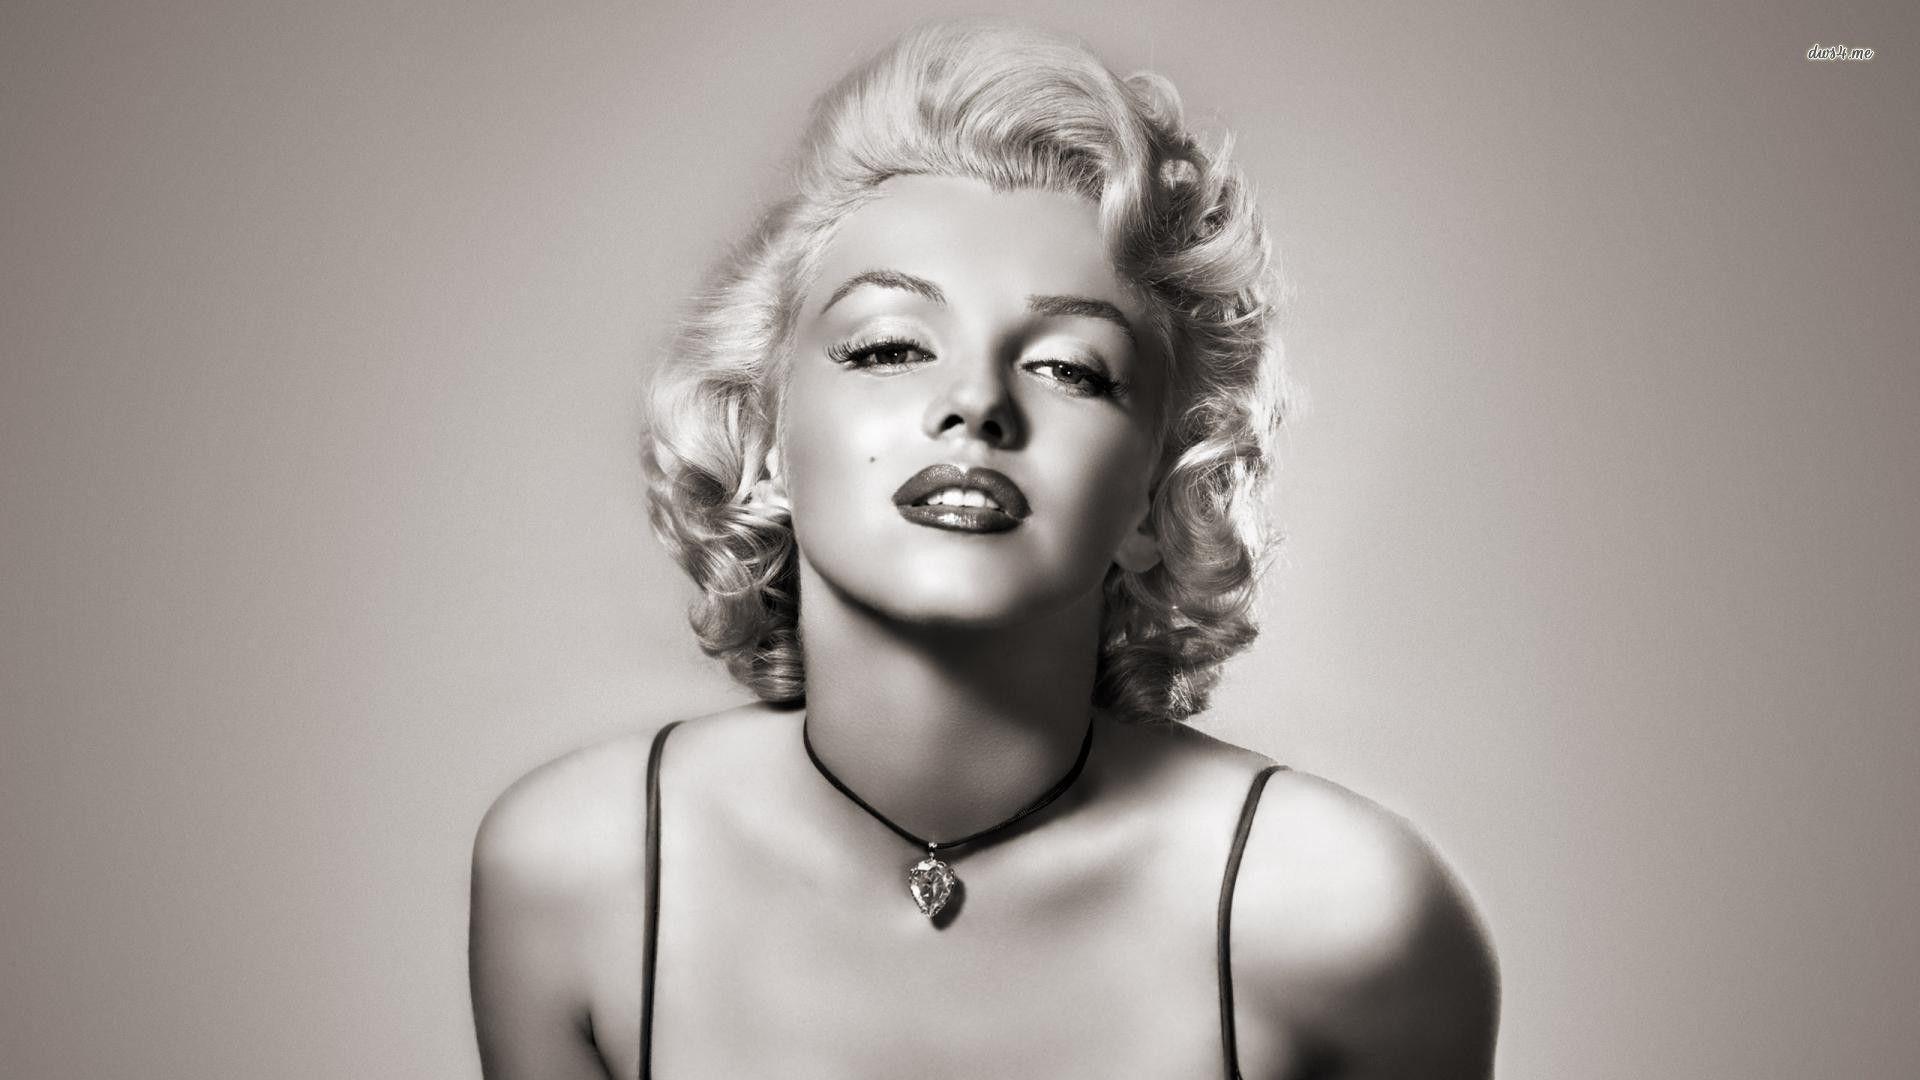 Marilyn Monroe Desktop HD Wallpaper - Beraplan.